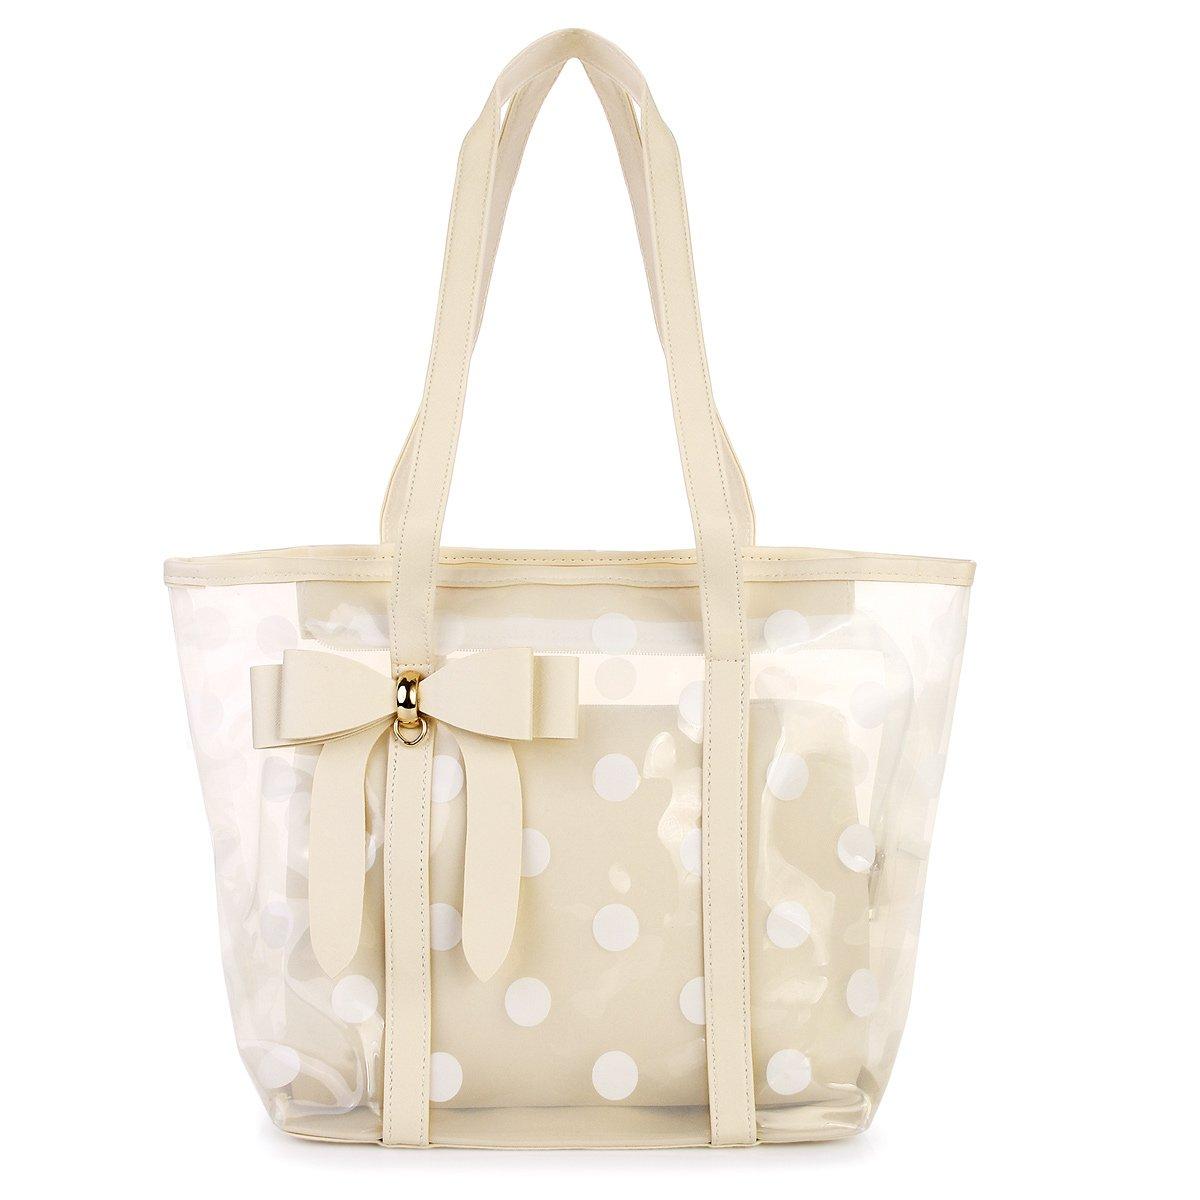 Women's Clear Tote Bags Shoulder Handbag Beach bag Shopping Bag (beige)